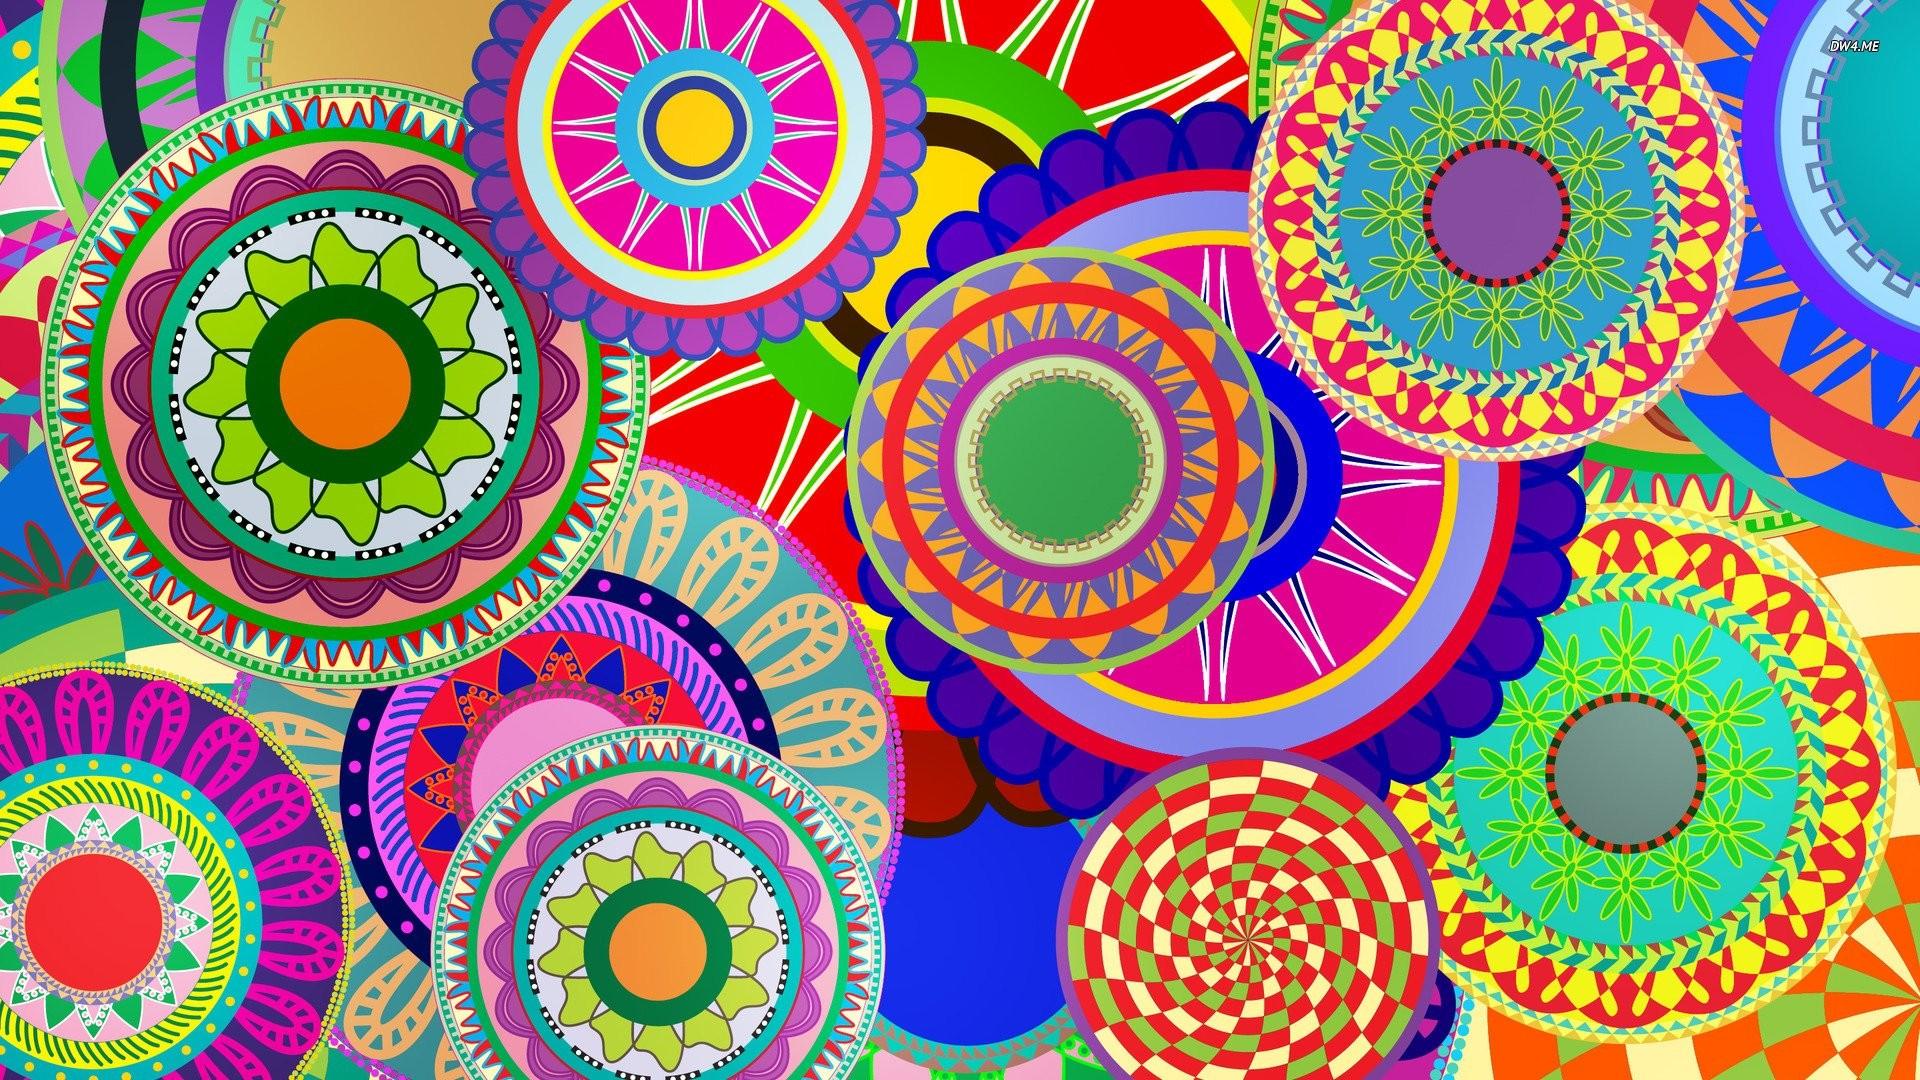 Colorful Wallpaper Designs ①